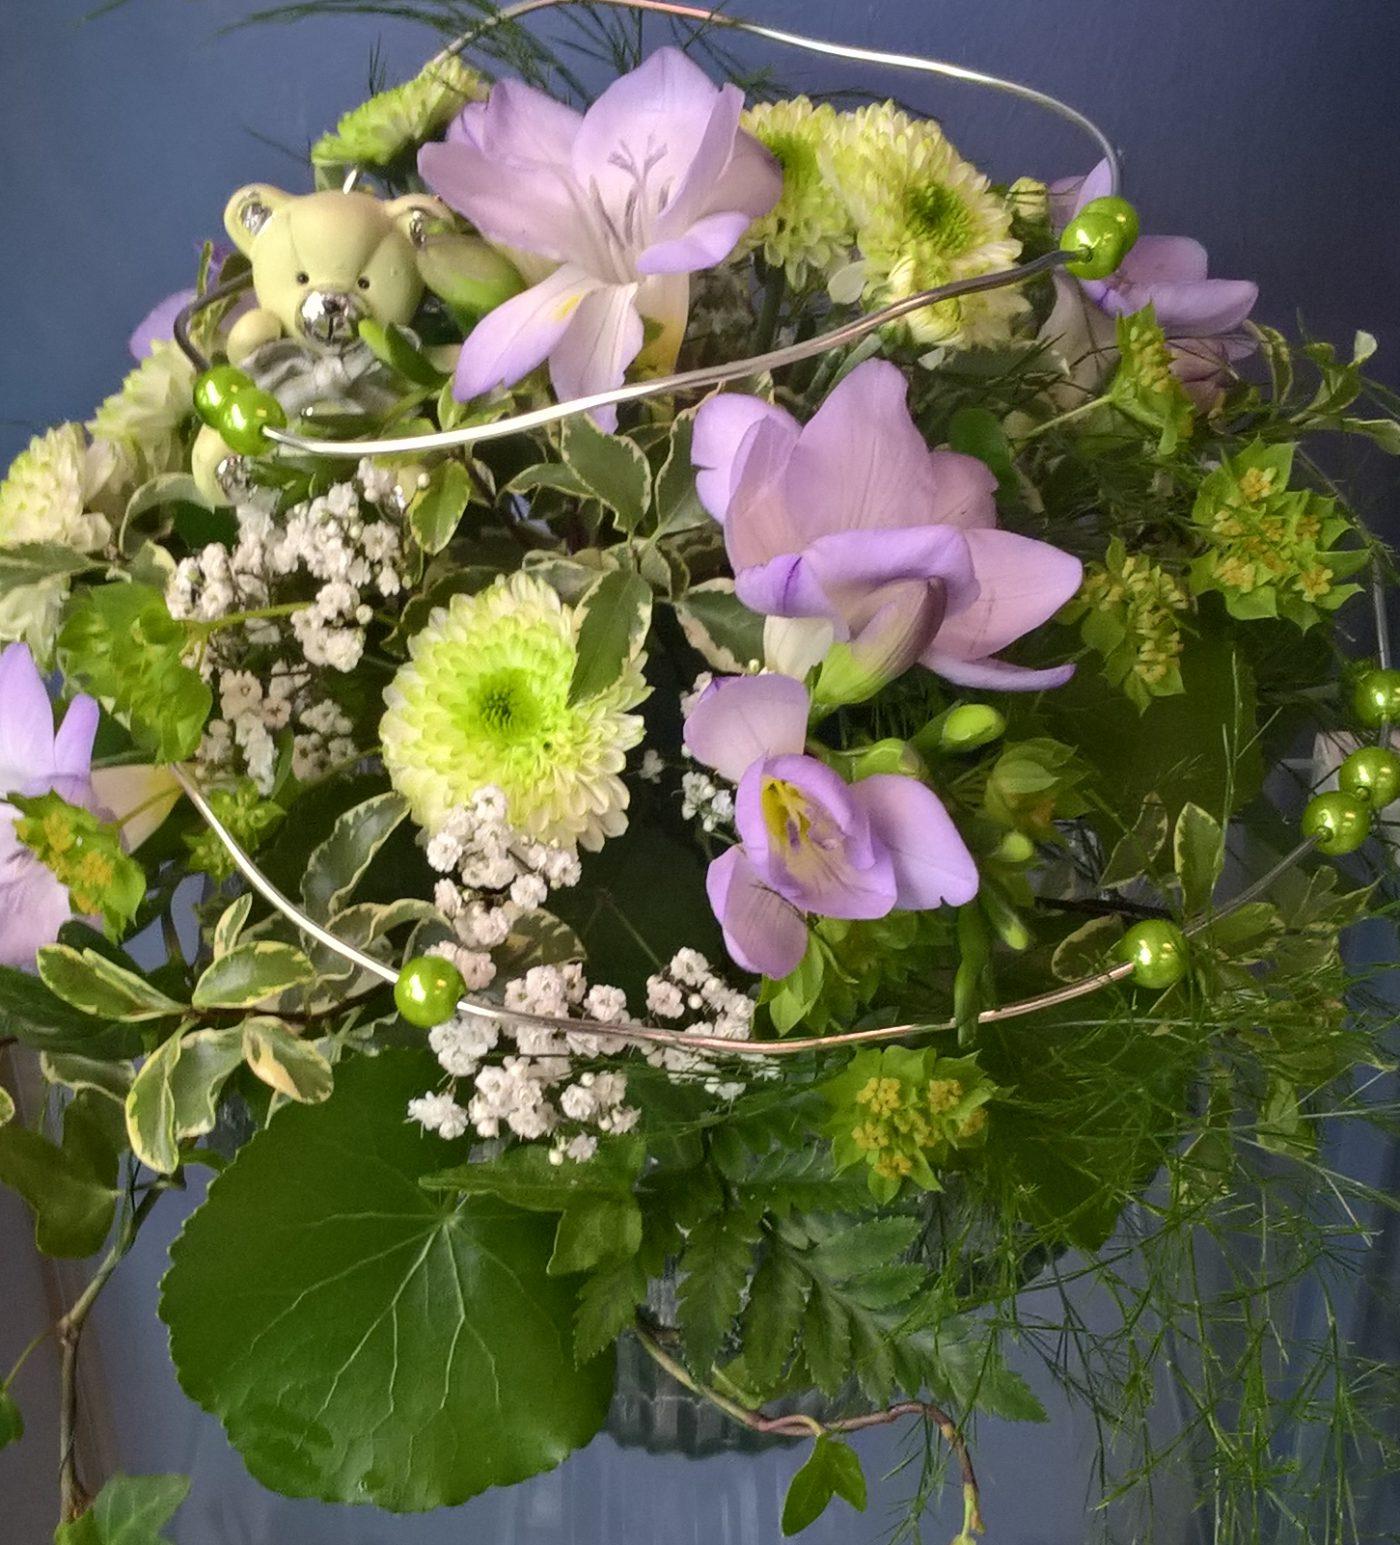 Kukkakauppa & Askarteluliike